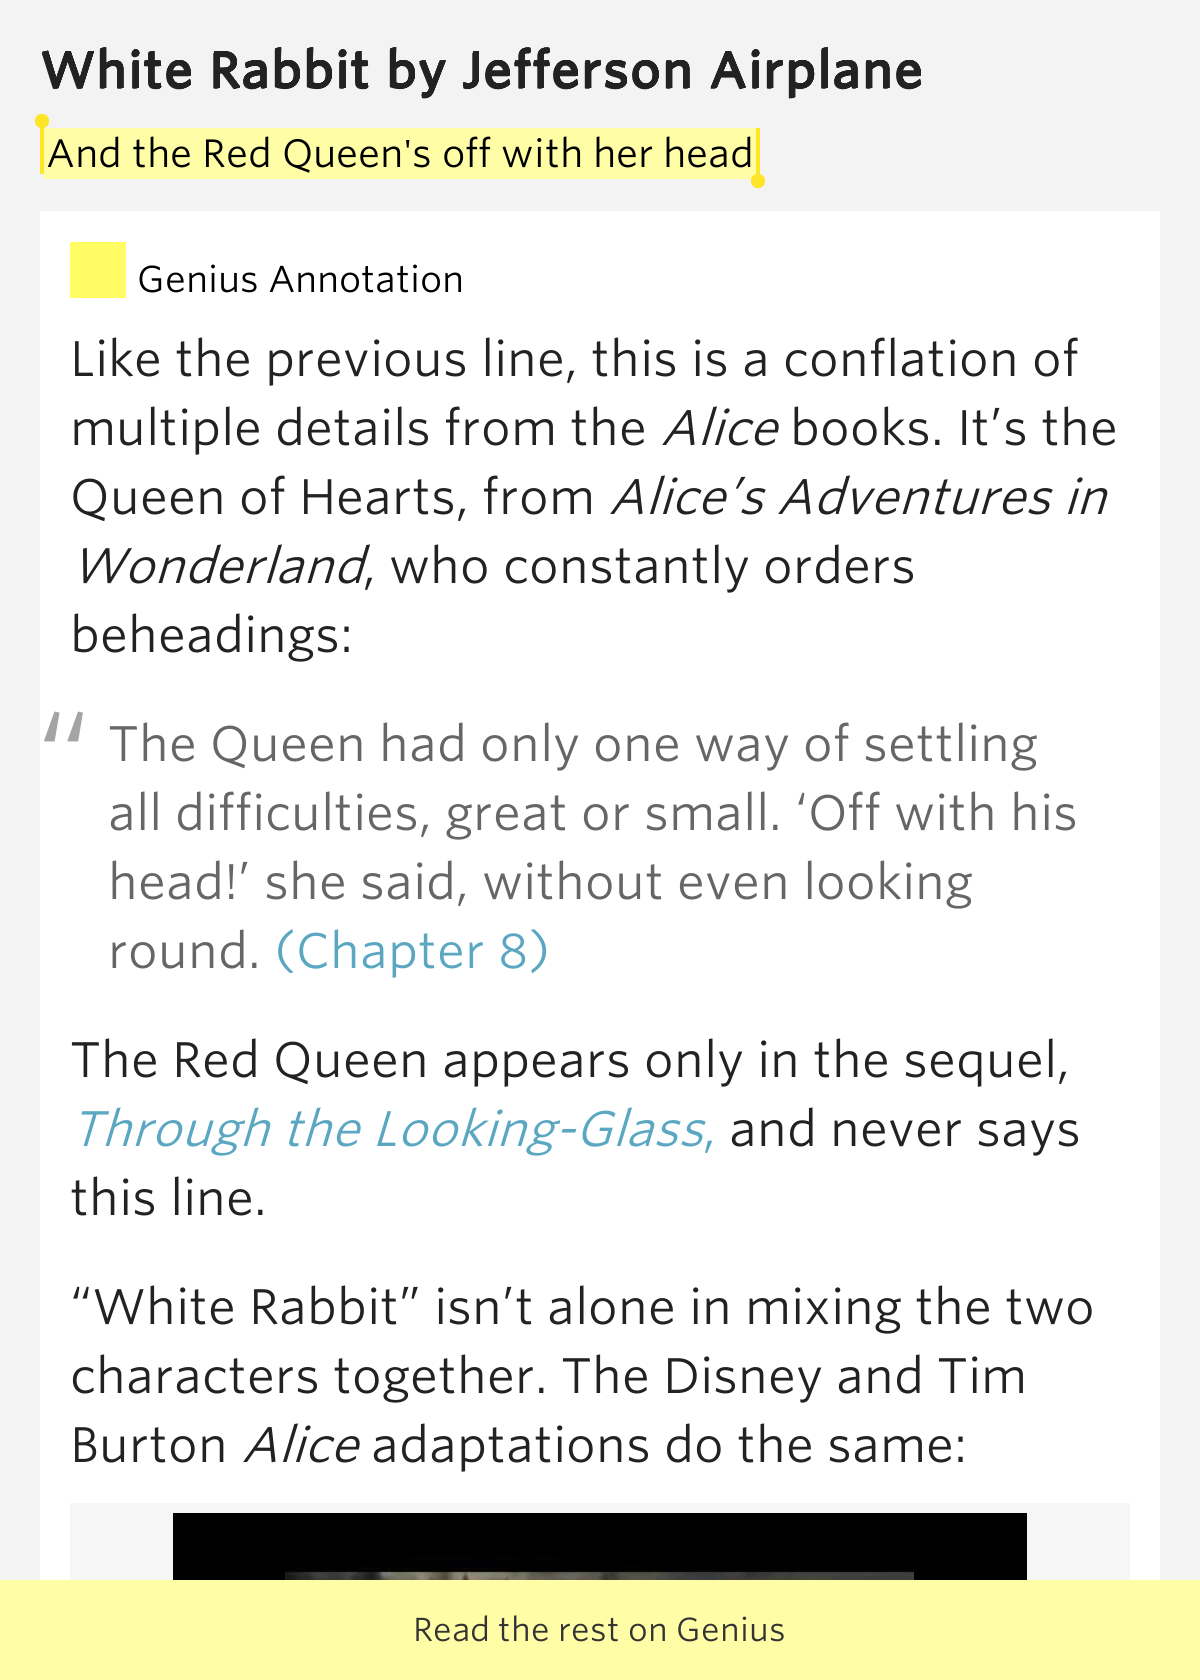 Jefferson Starship White Rabbit Meaning - addiafern-mp3